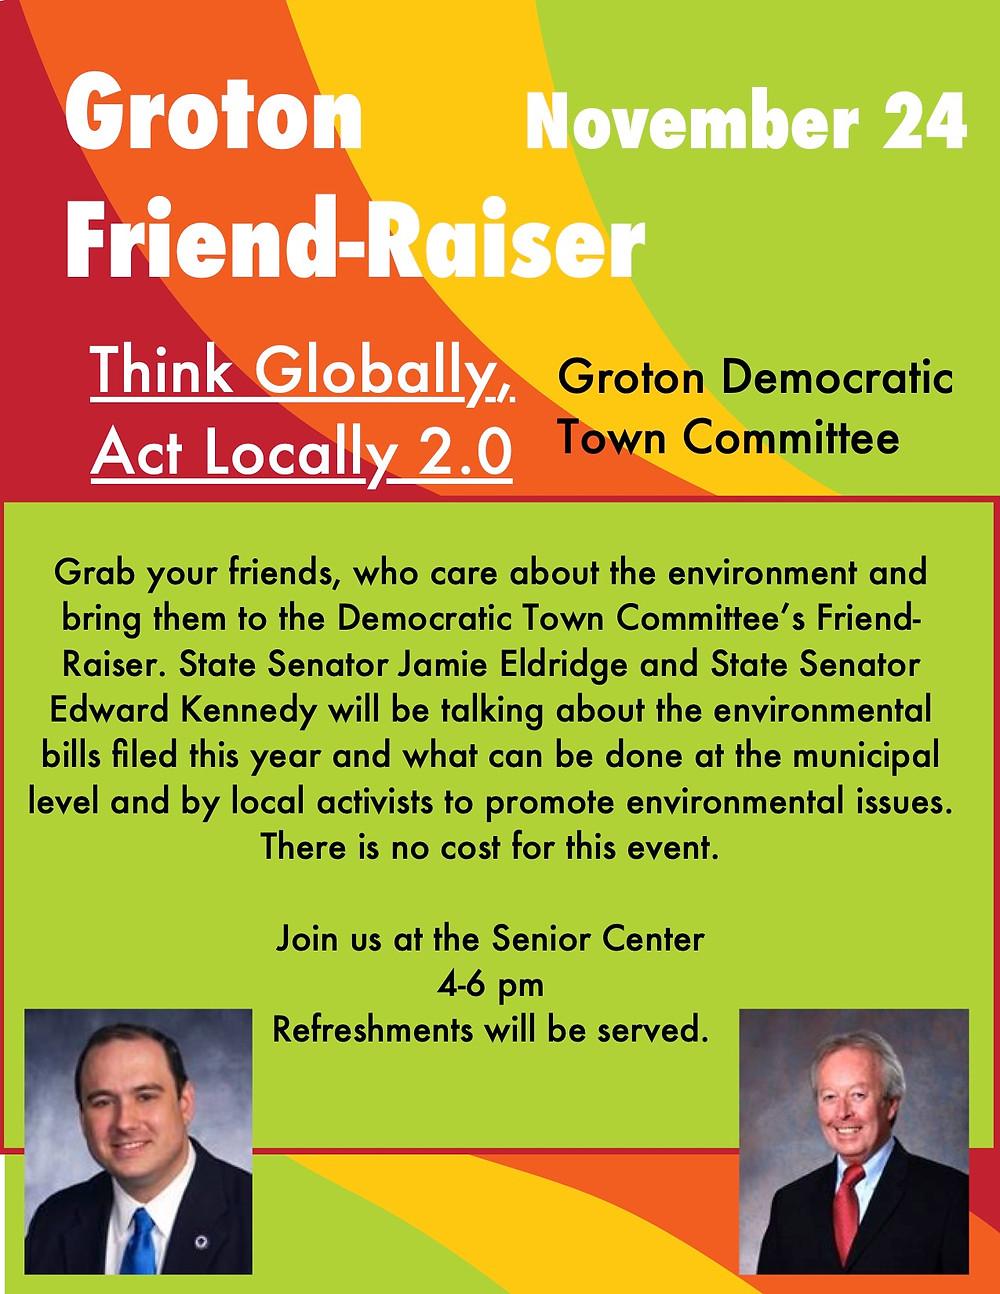 Please join us at the new Senior Center on Nov.24